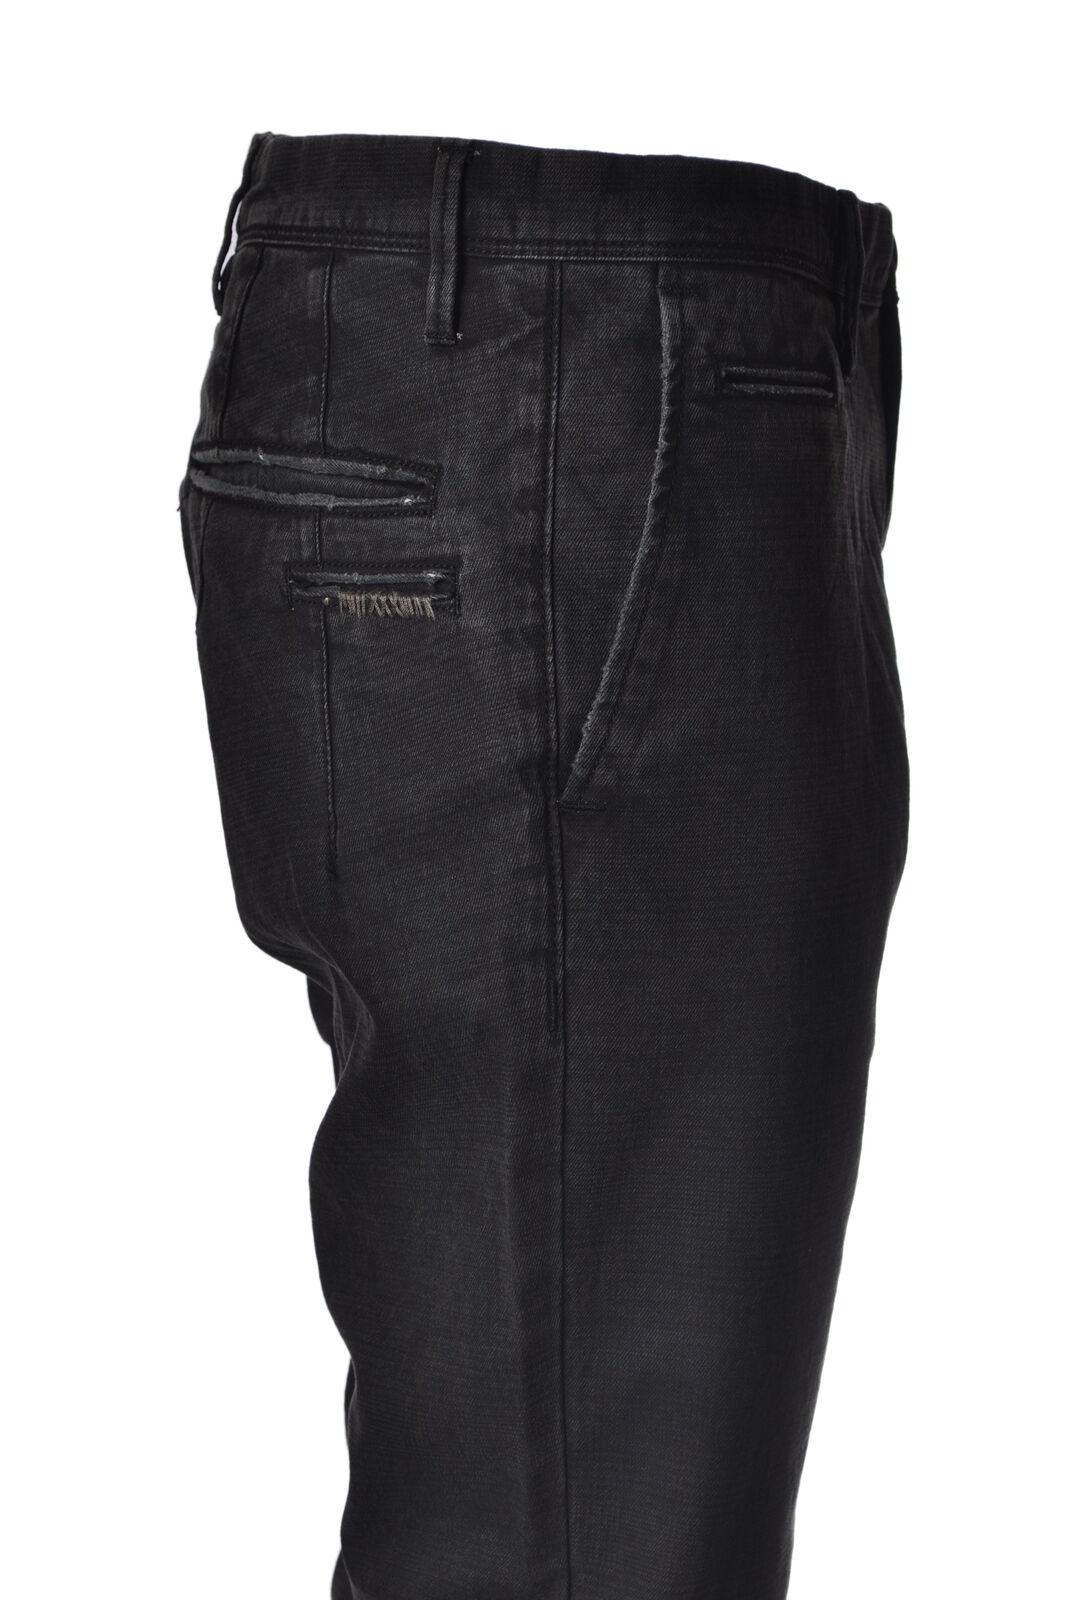 Siviglia - Pants-Pants - Man - Fantasy - 4688820N180558